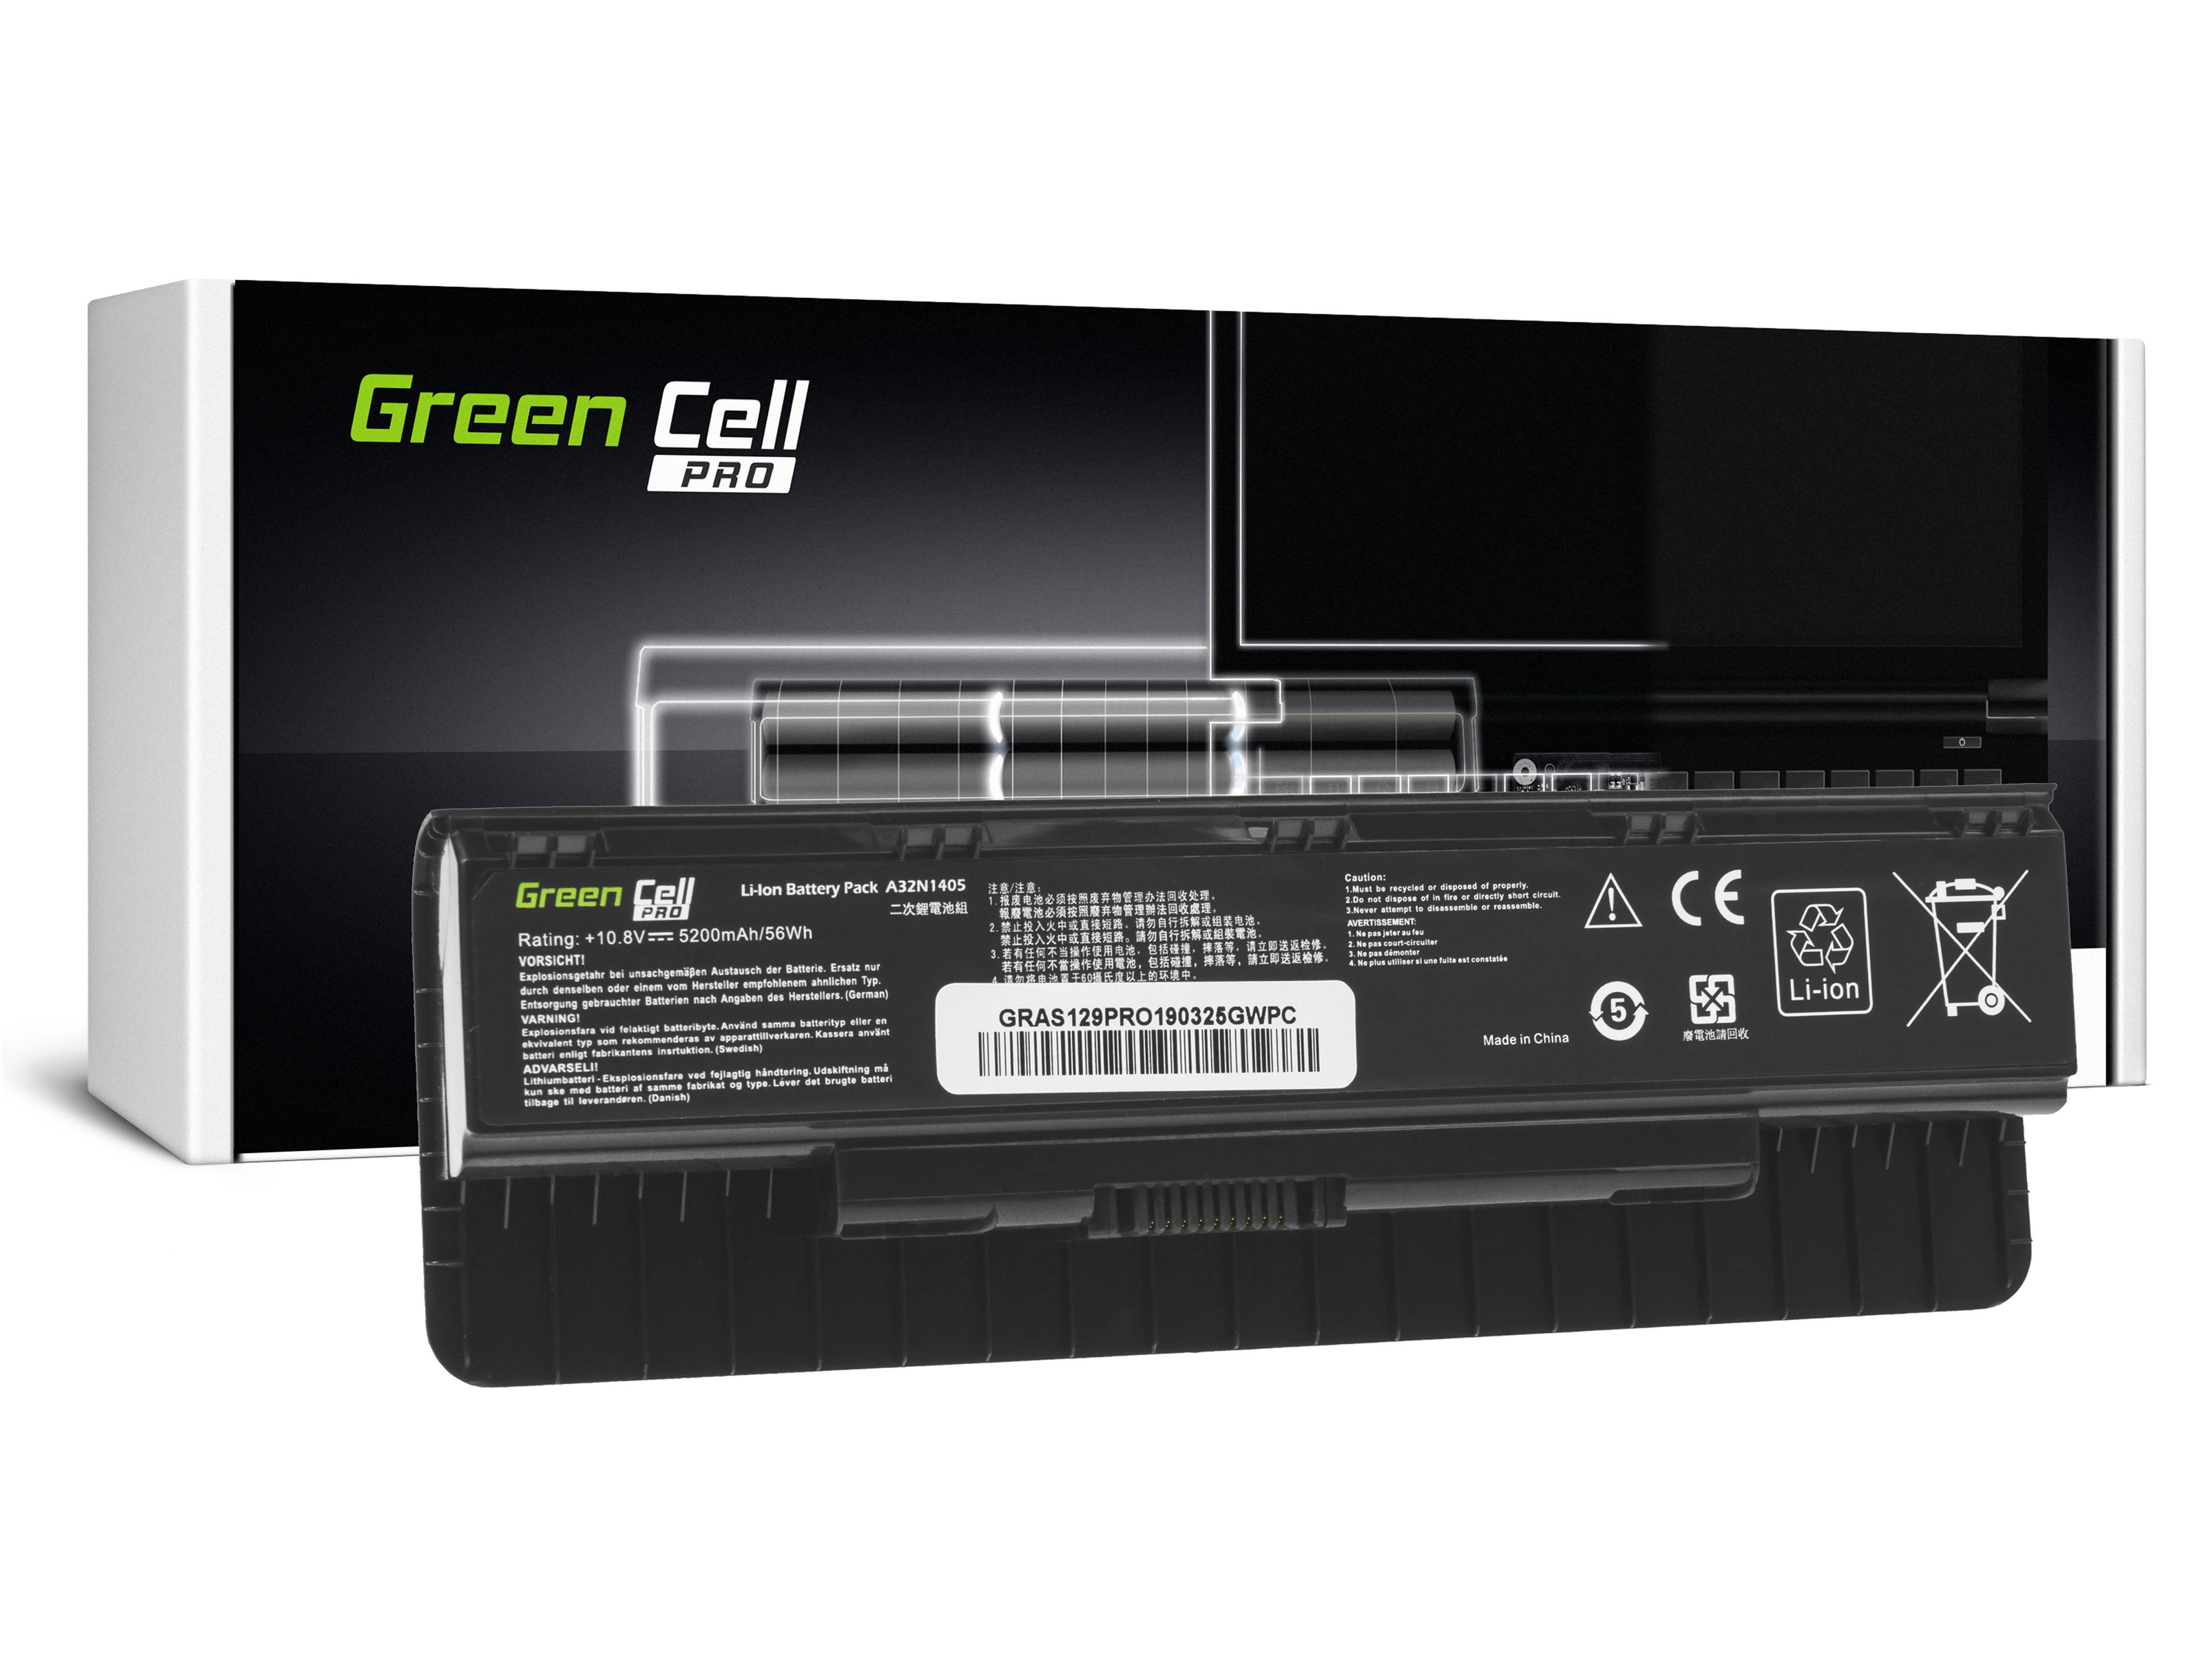 Green Cell AS129PRO Baterie Asus A32N1405, Asus G551 G551J G551JM G551JW G771 G771J G771JM G771JW N551 N551J N551JM N551JW N551JX 5200mAh Li-ion - neoriginální